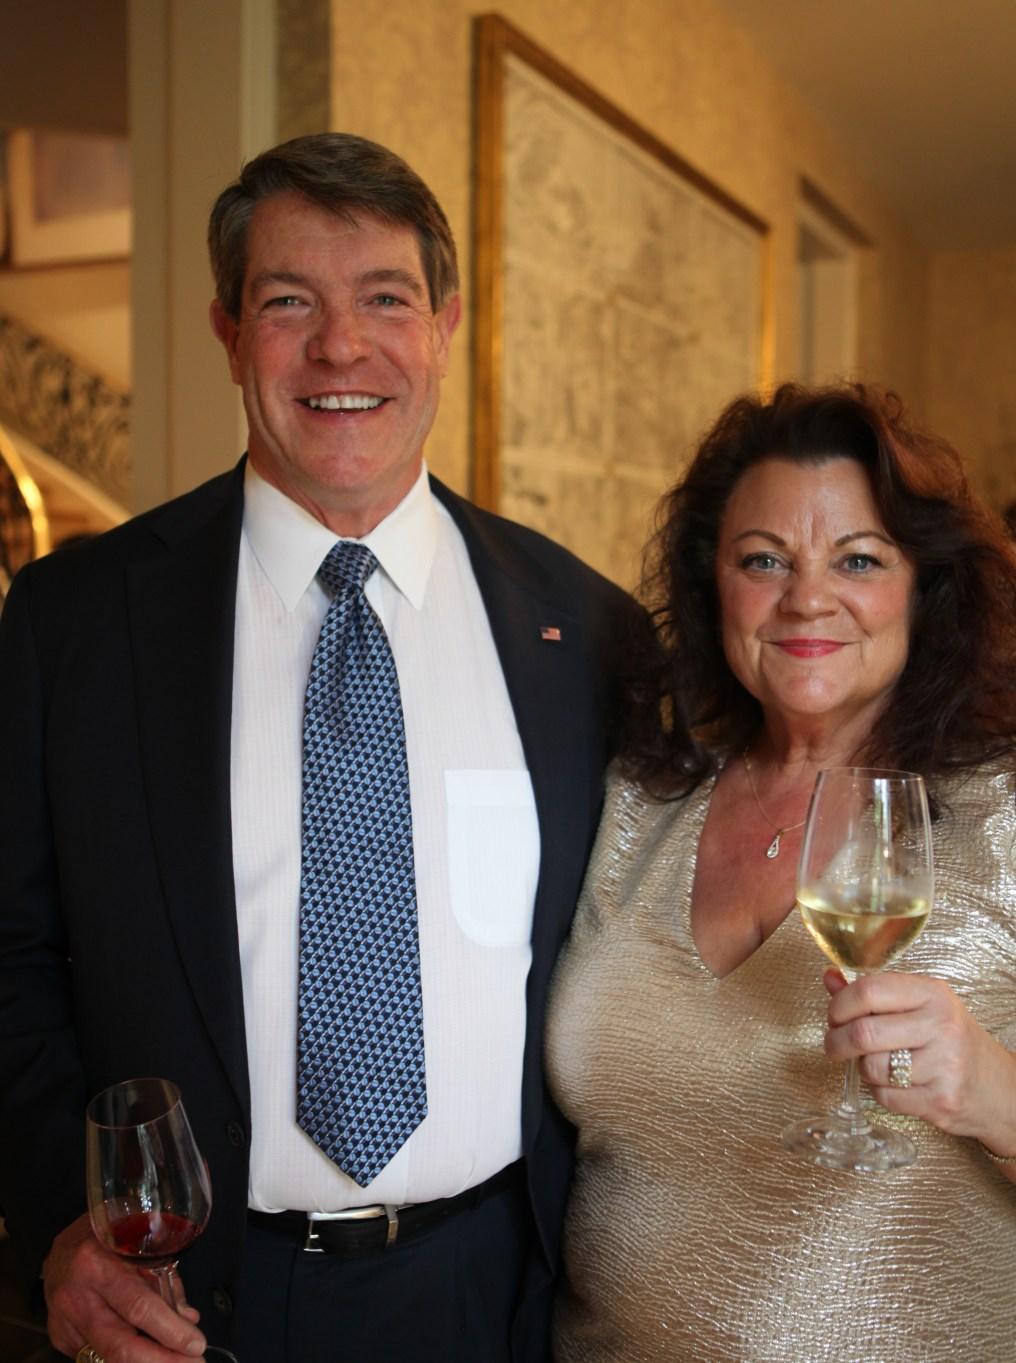 Bill and Sharon Piper